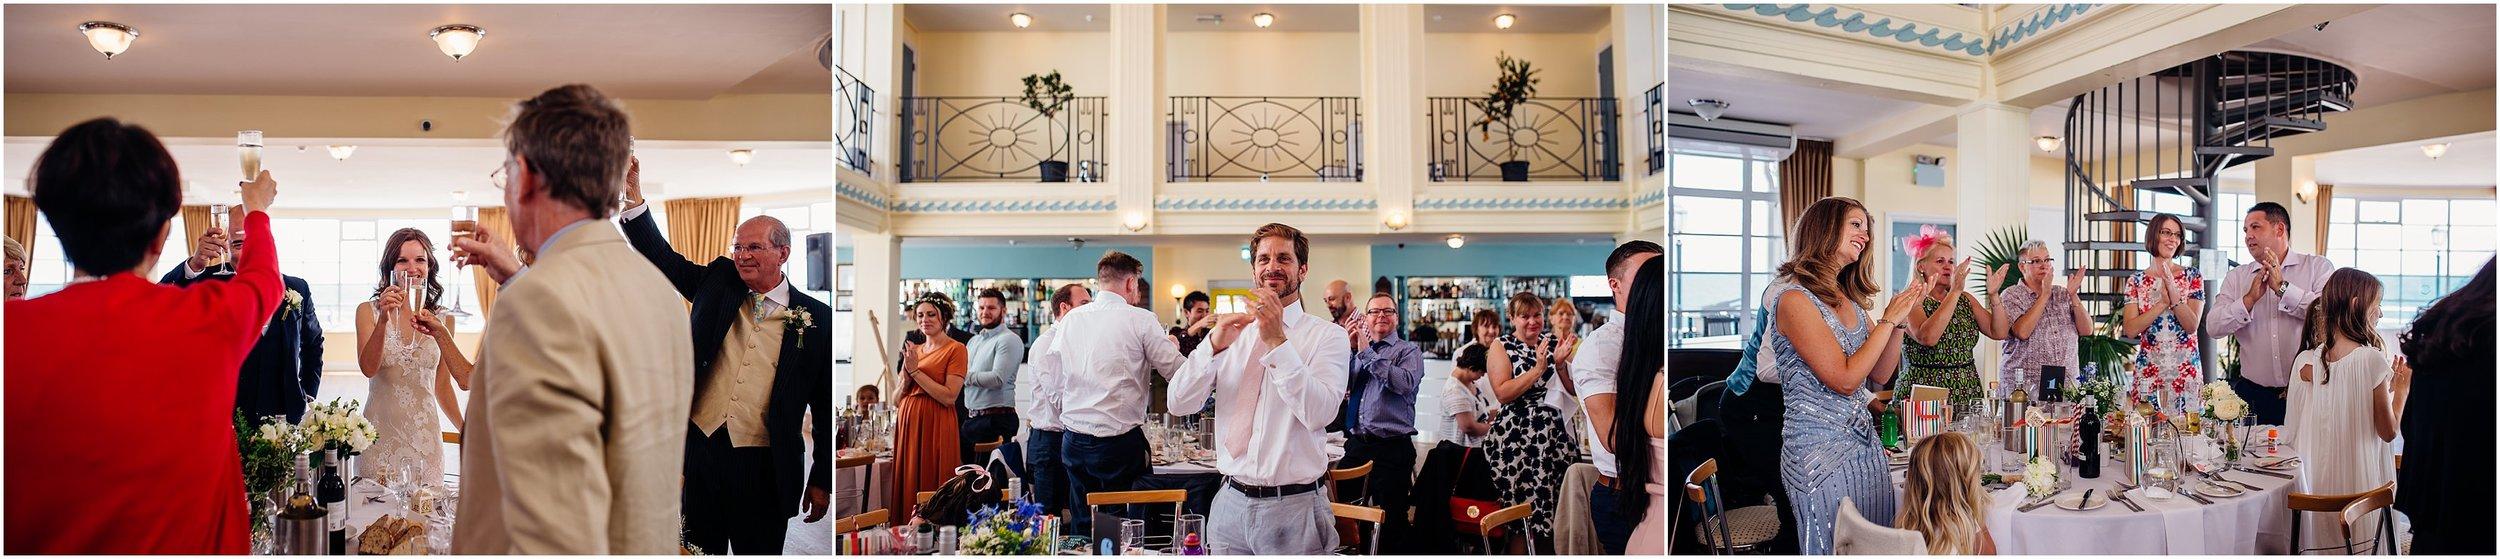 Art Deco Worthing Pier Wedding_0050.jpg